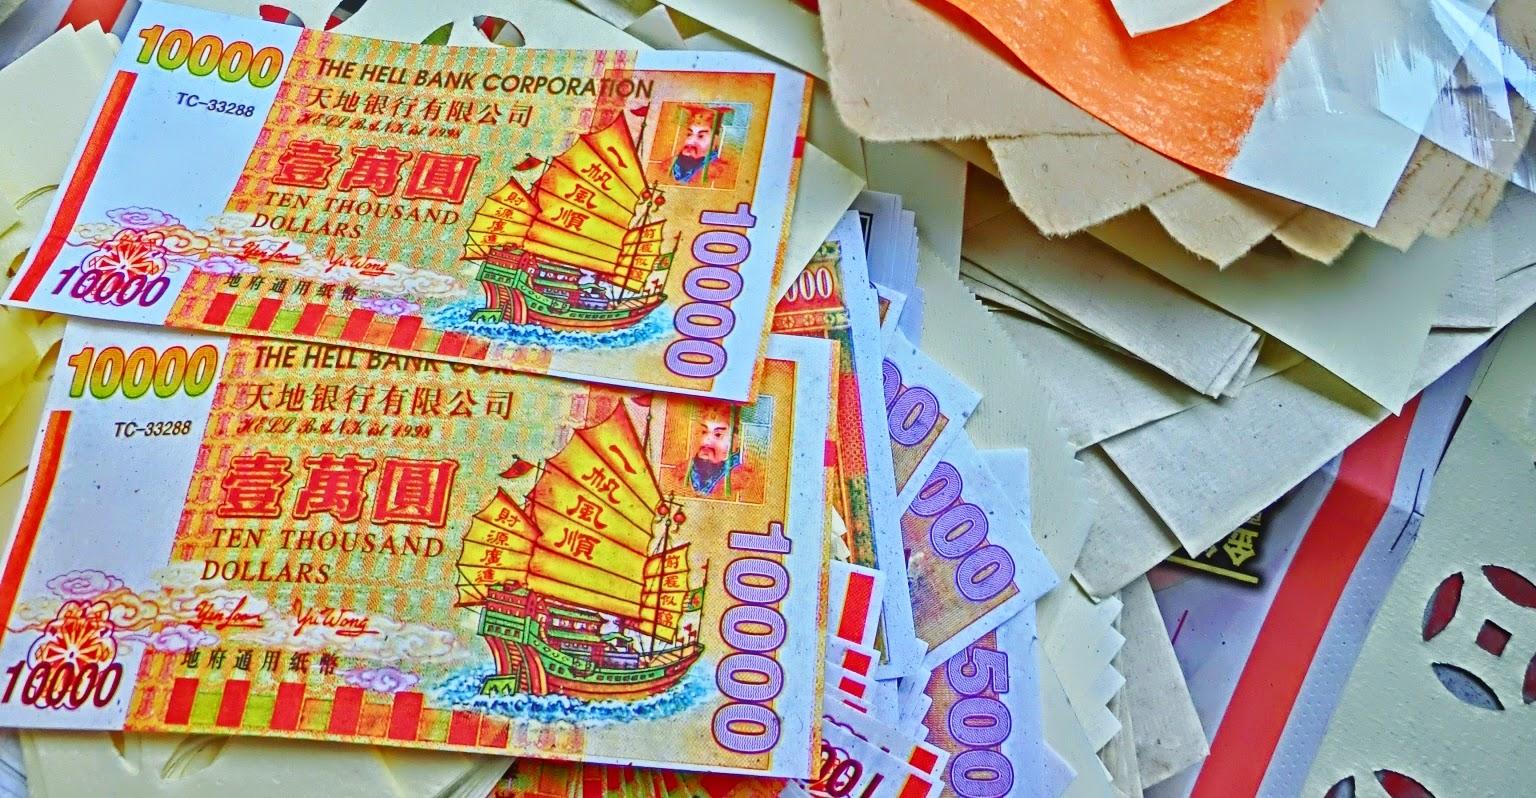 http://upload.wikimedia.org/wikipedia/commons/b/be/HK_Chai_Wan_Cape_Collinson_Crematorium_%E5%86%A5%E9%80%9A%E9%8A%80%E8%A1%8C_Joss_paper_money_%E5%86%A5%E9%8F%B9_offerings_May-2013_The_Hell_Bank_Co_Notes.JPG